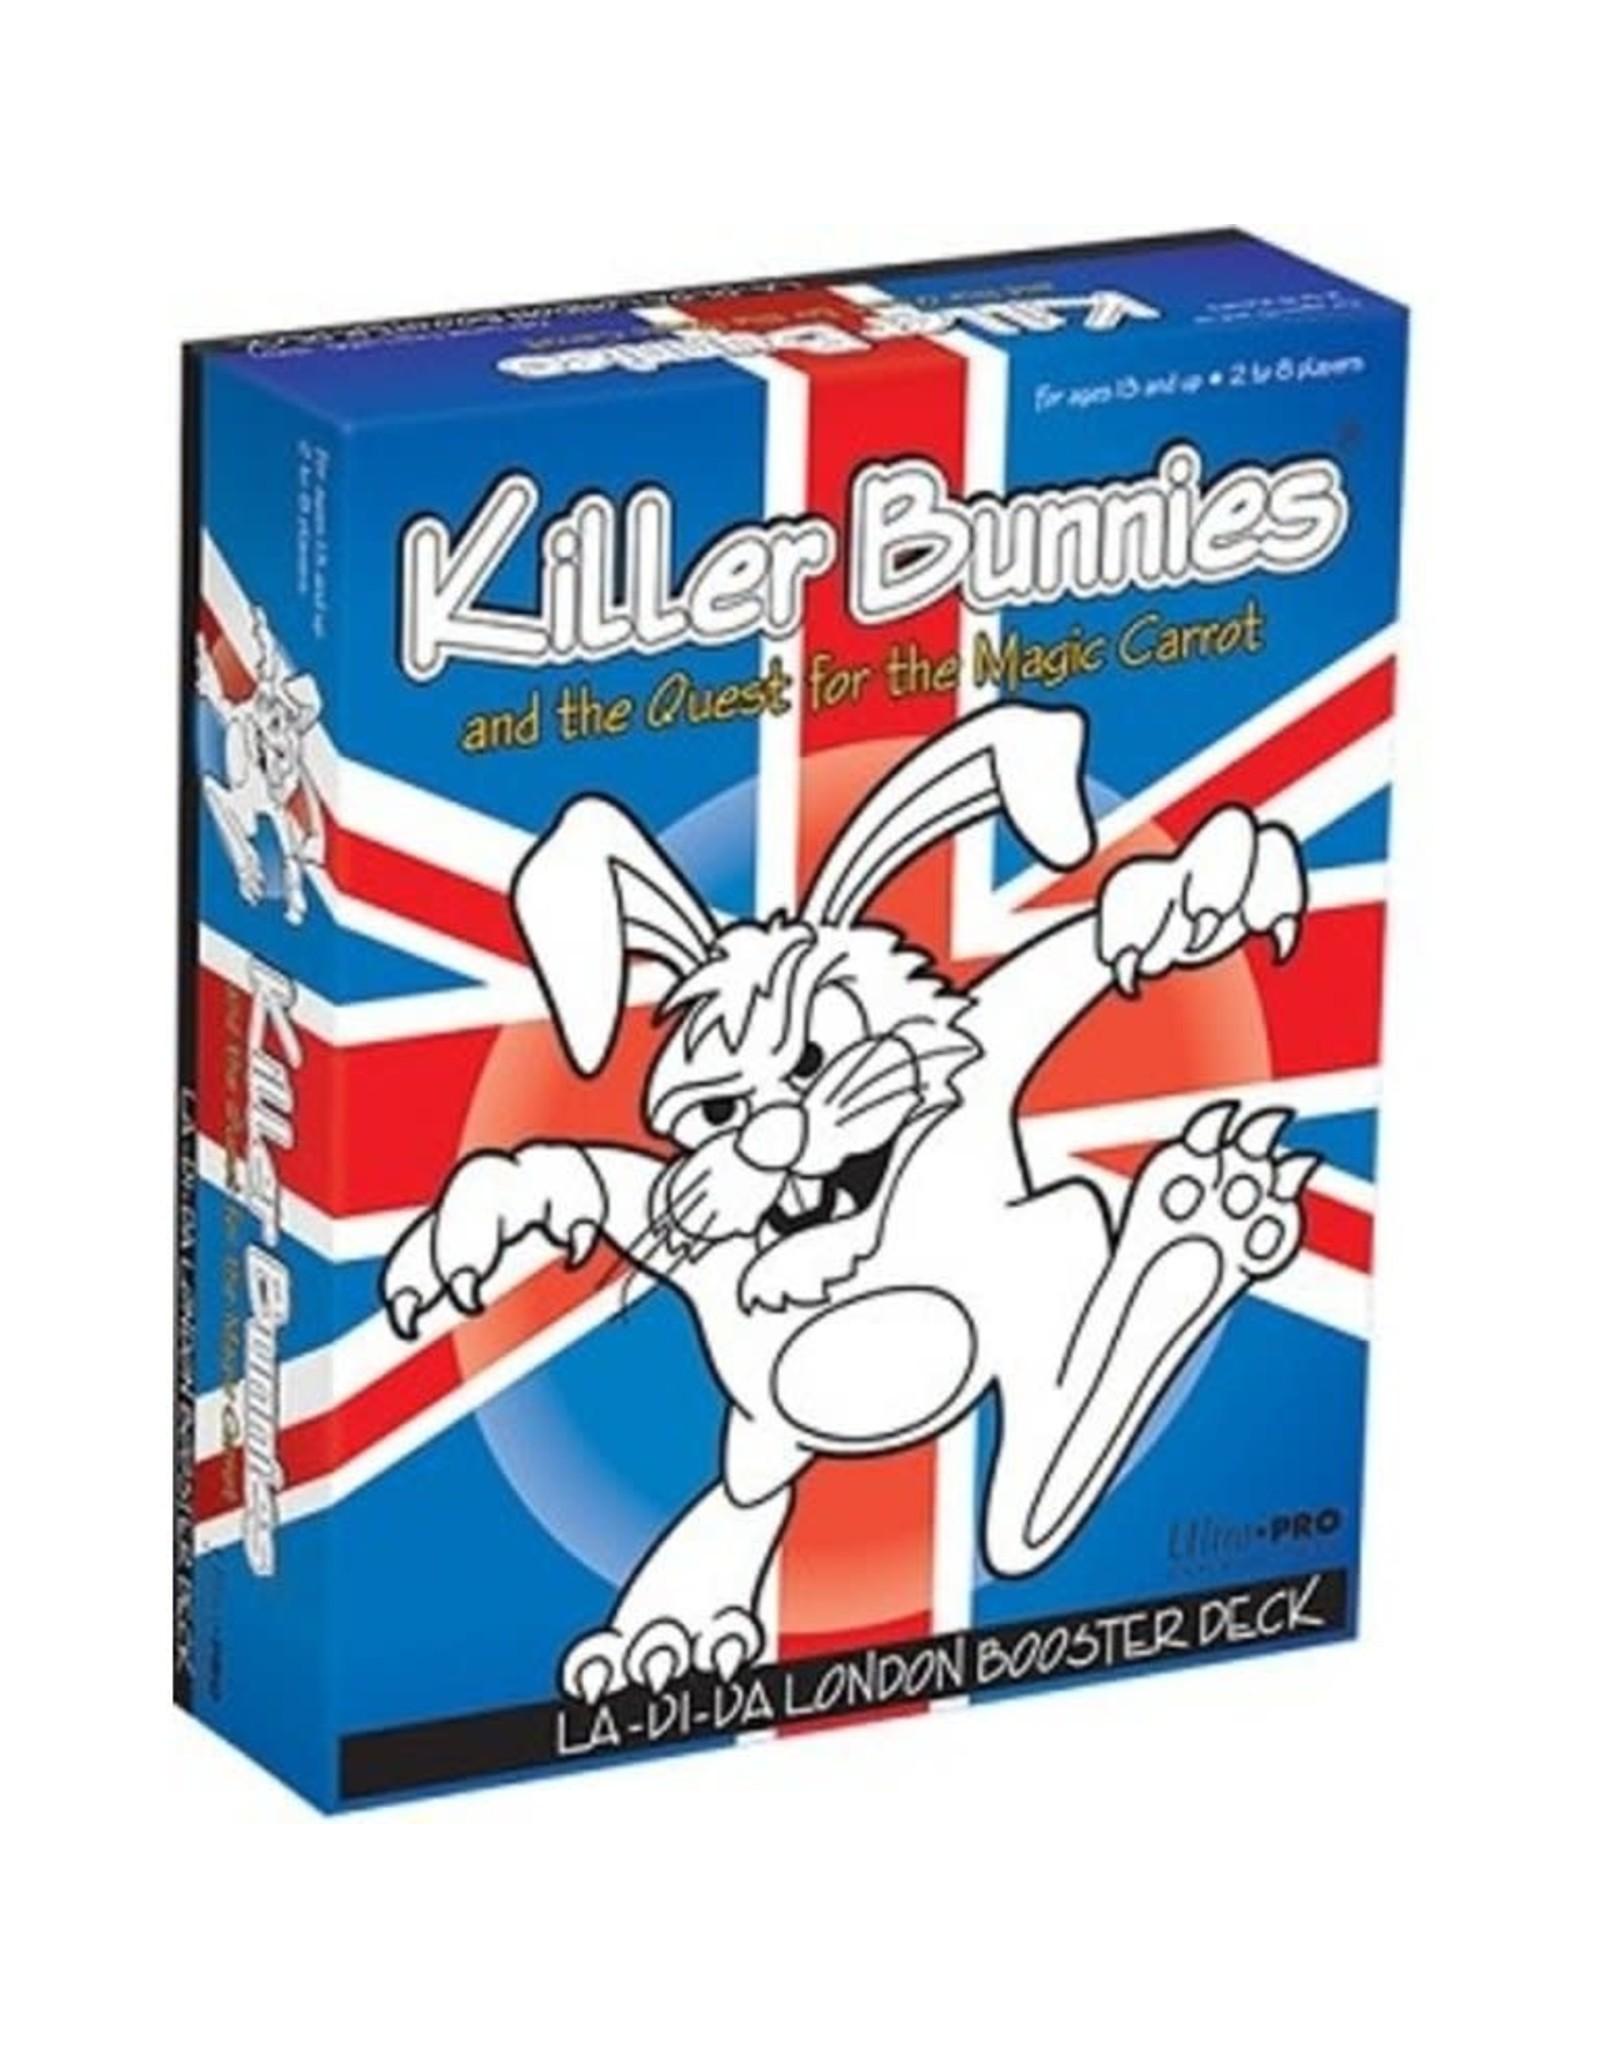 Killer Bunnies LaDiDa London Booster Deck